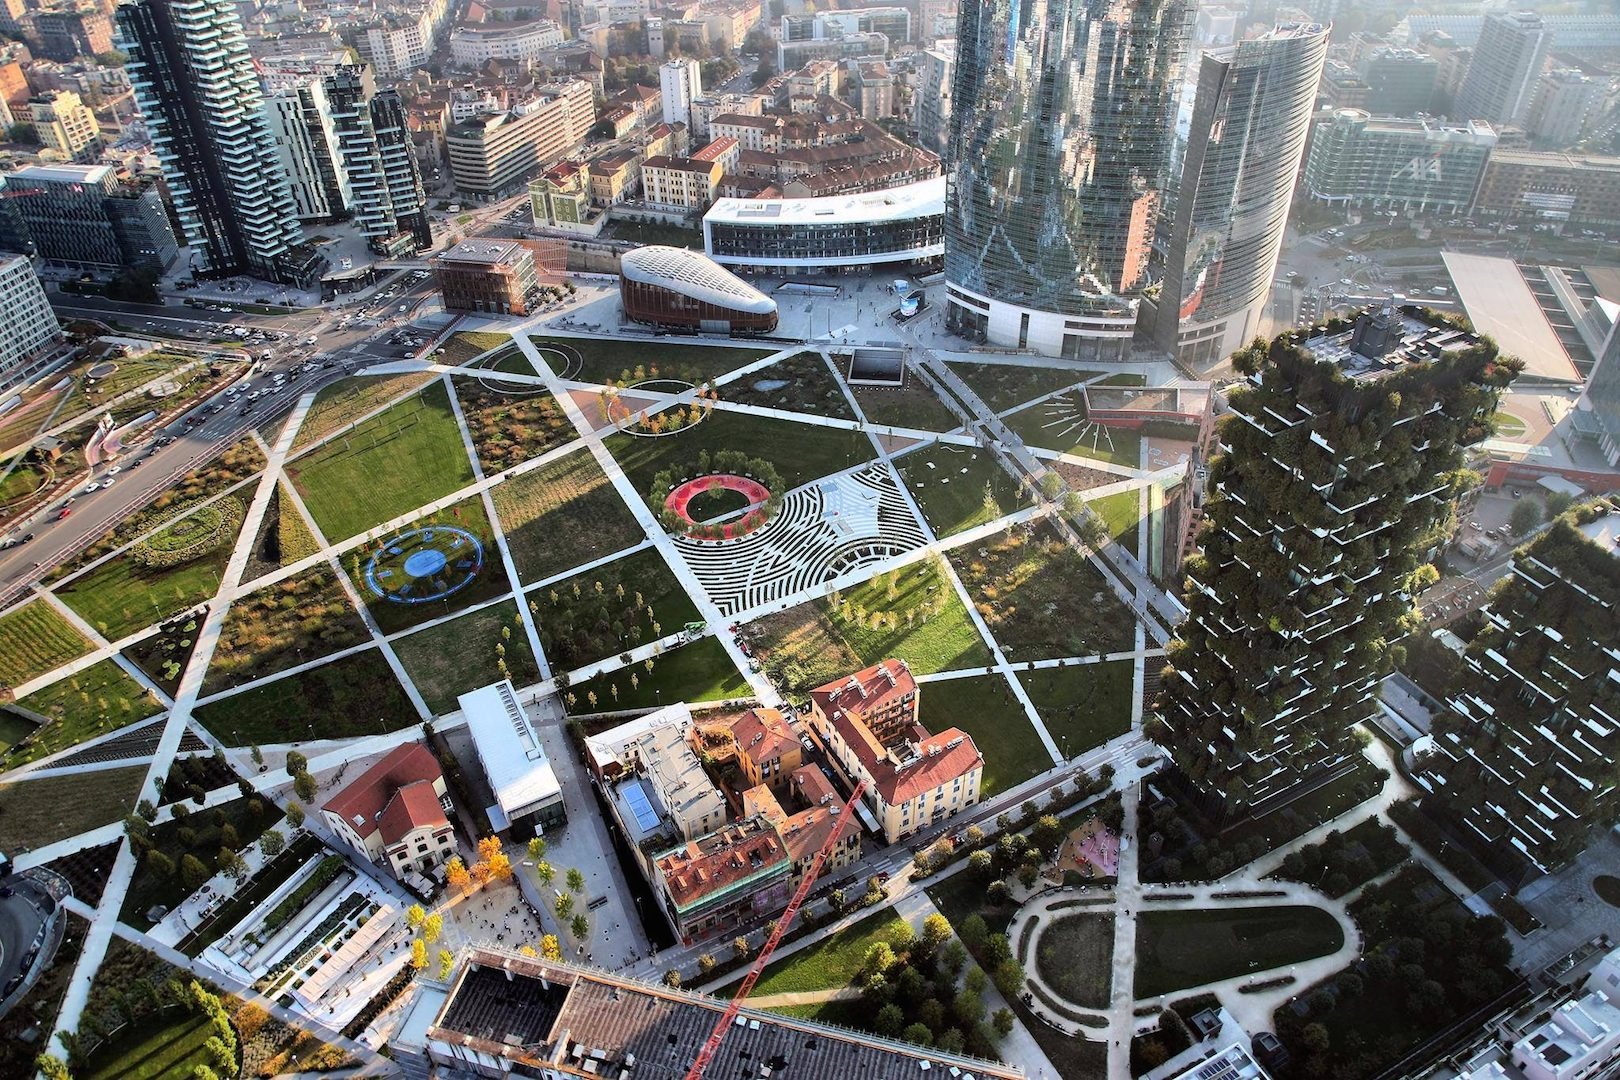 Studio Architettura Paesaggio Milano the new milan is green. and designs its urban future through